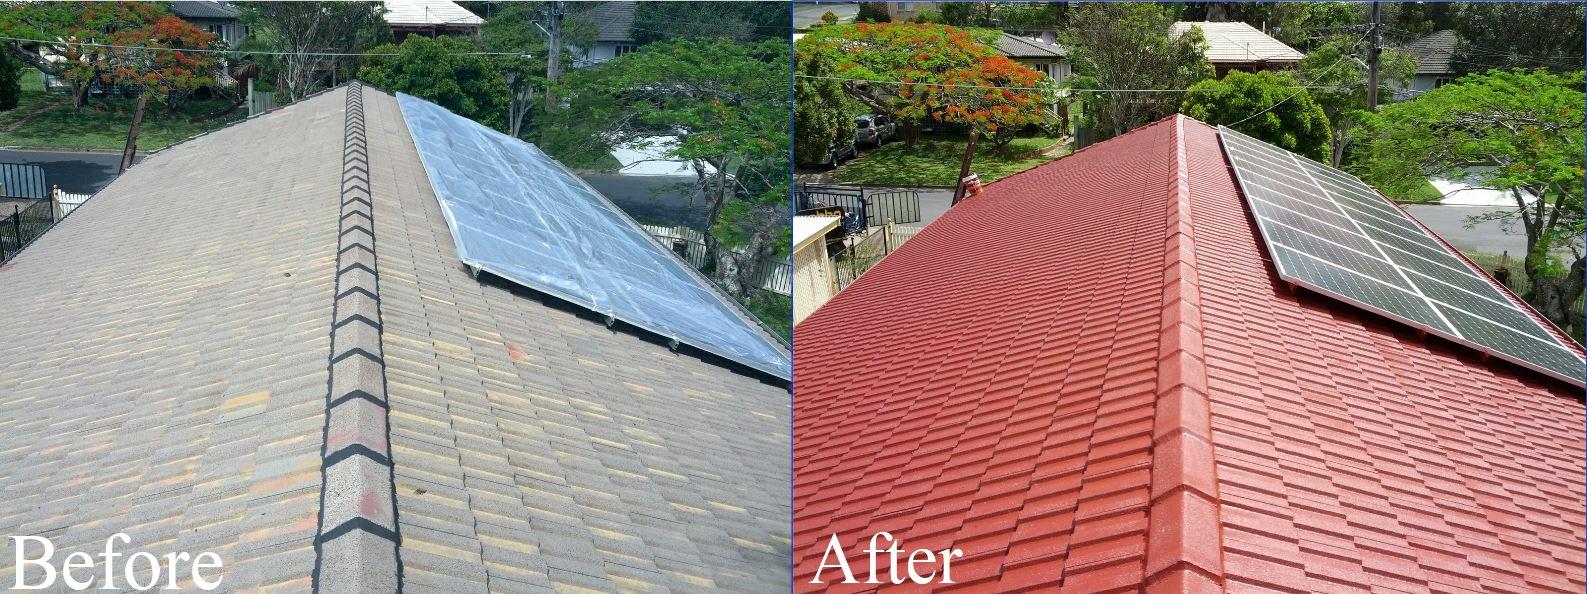 Painters Durbanville Roof Painting Contractors Cape Town